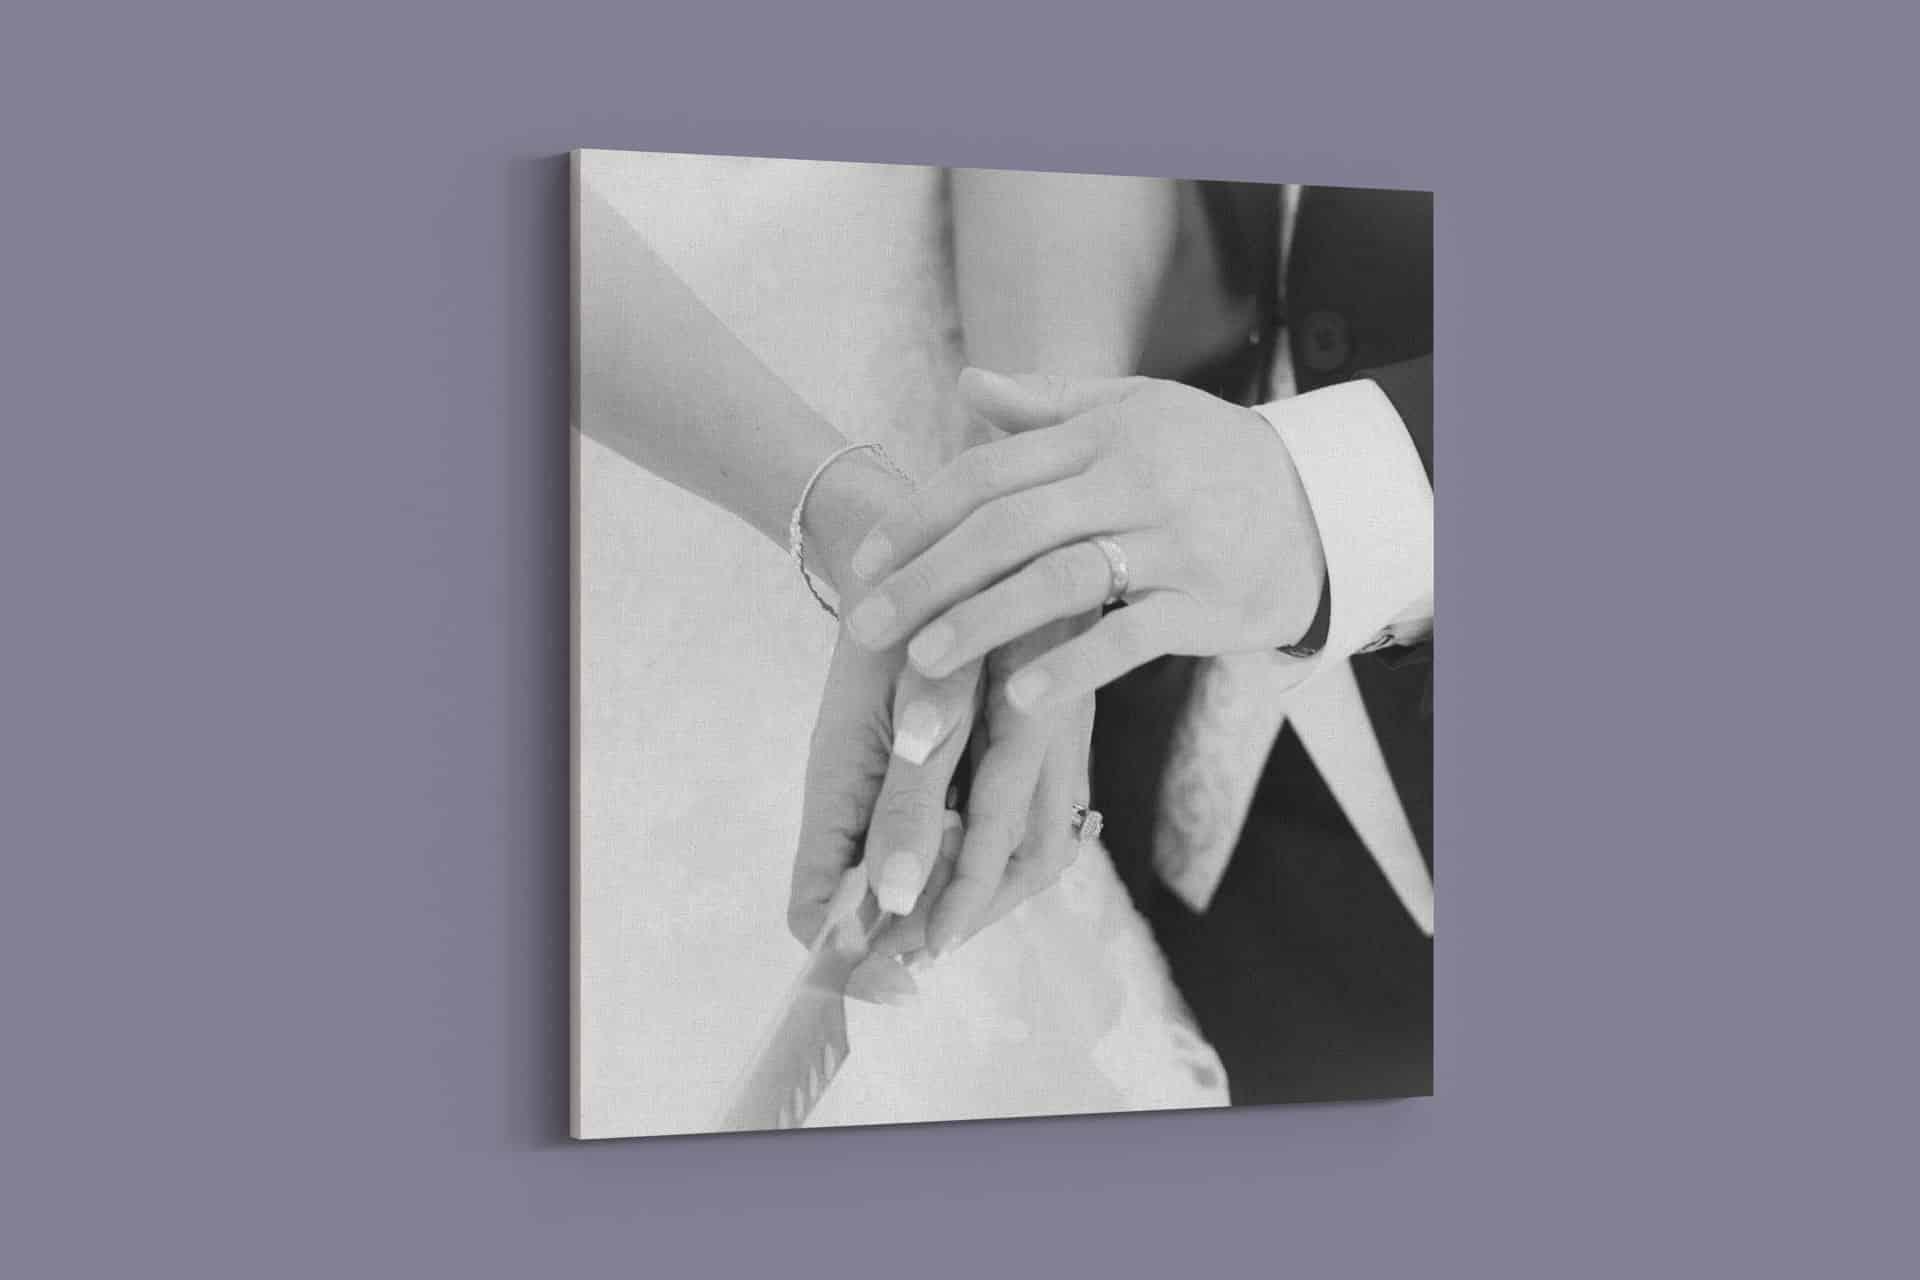 canvas-print-getitprinted.com-square-wedding-1.jpg